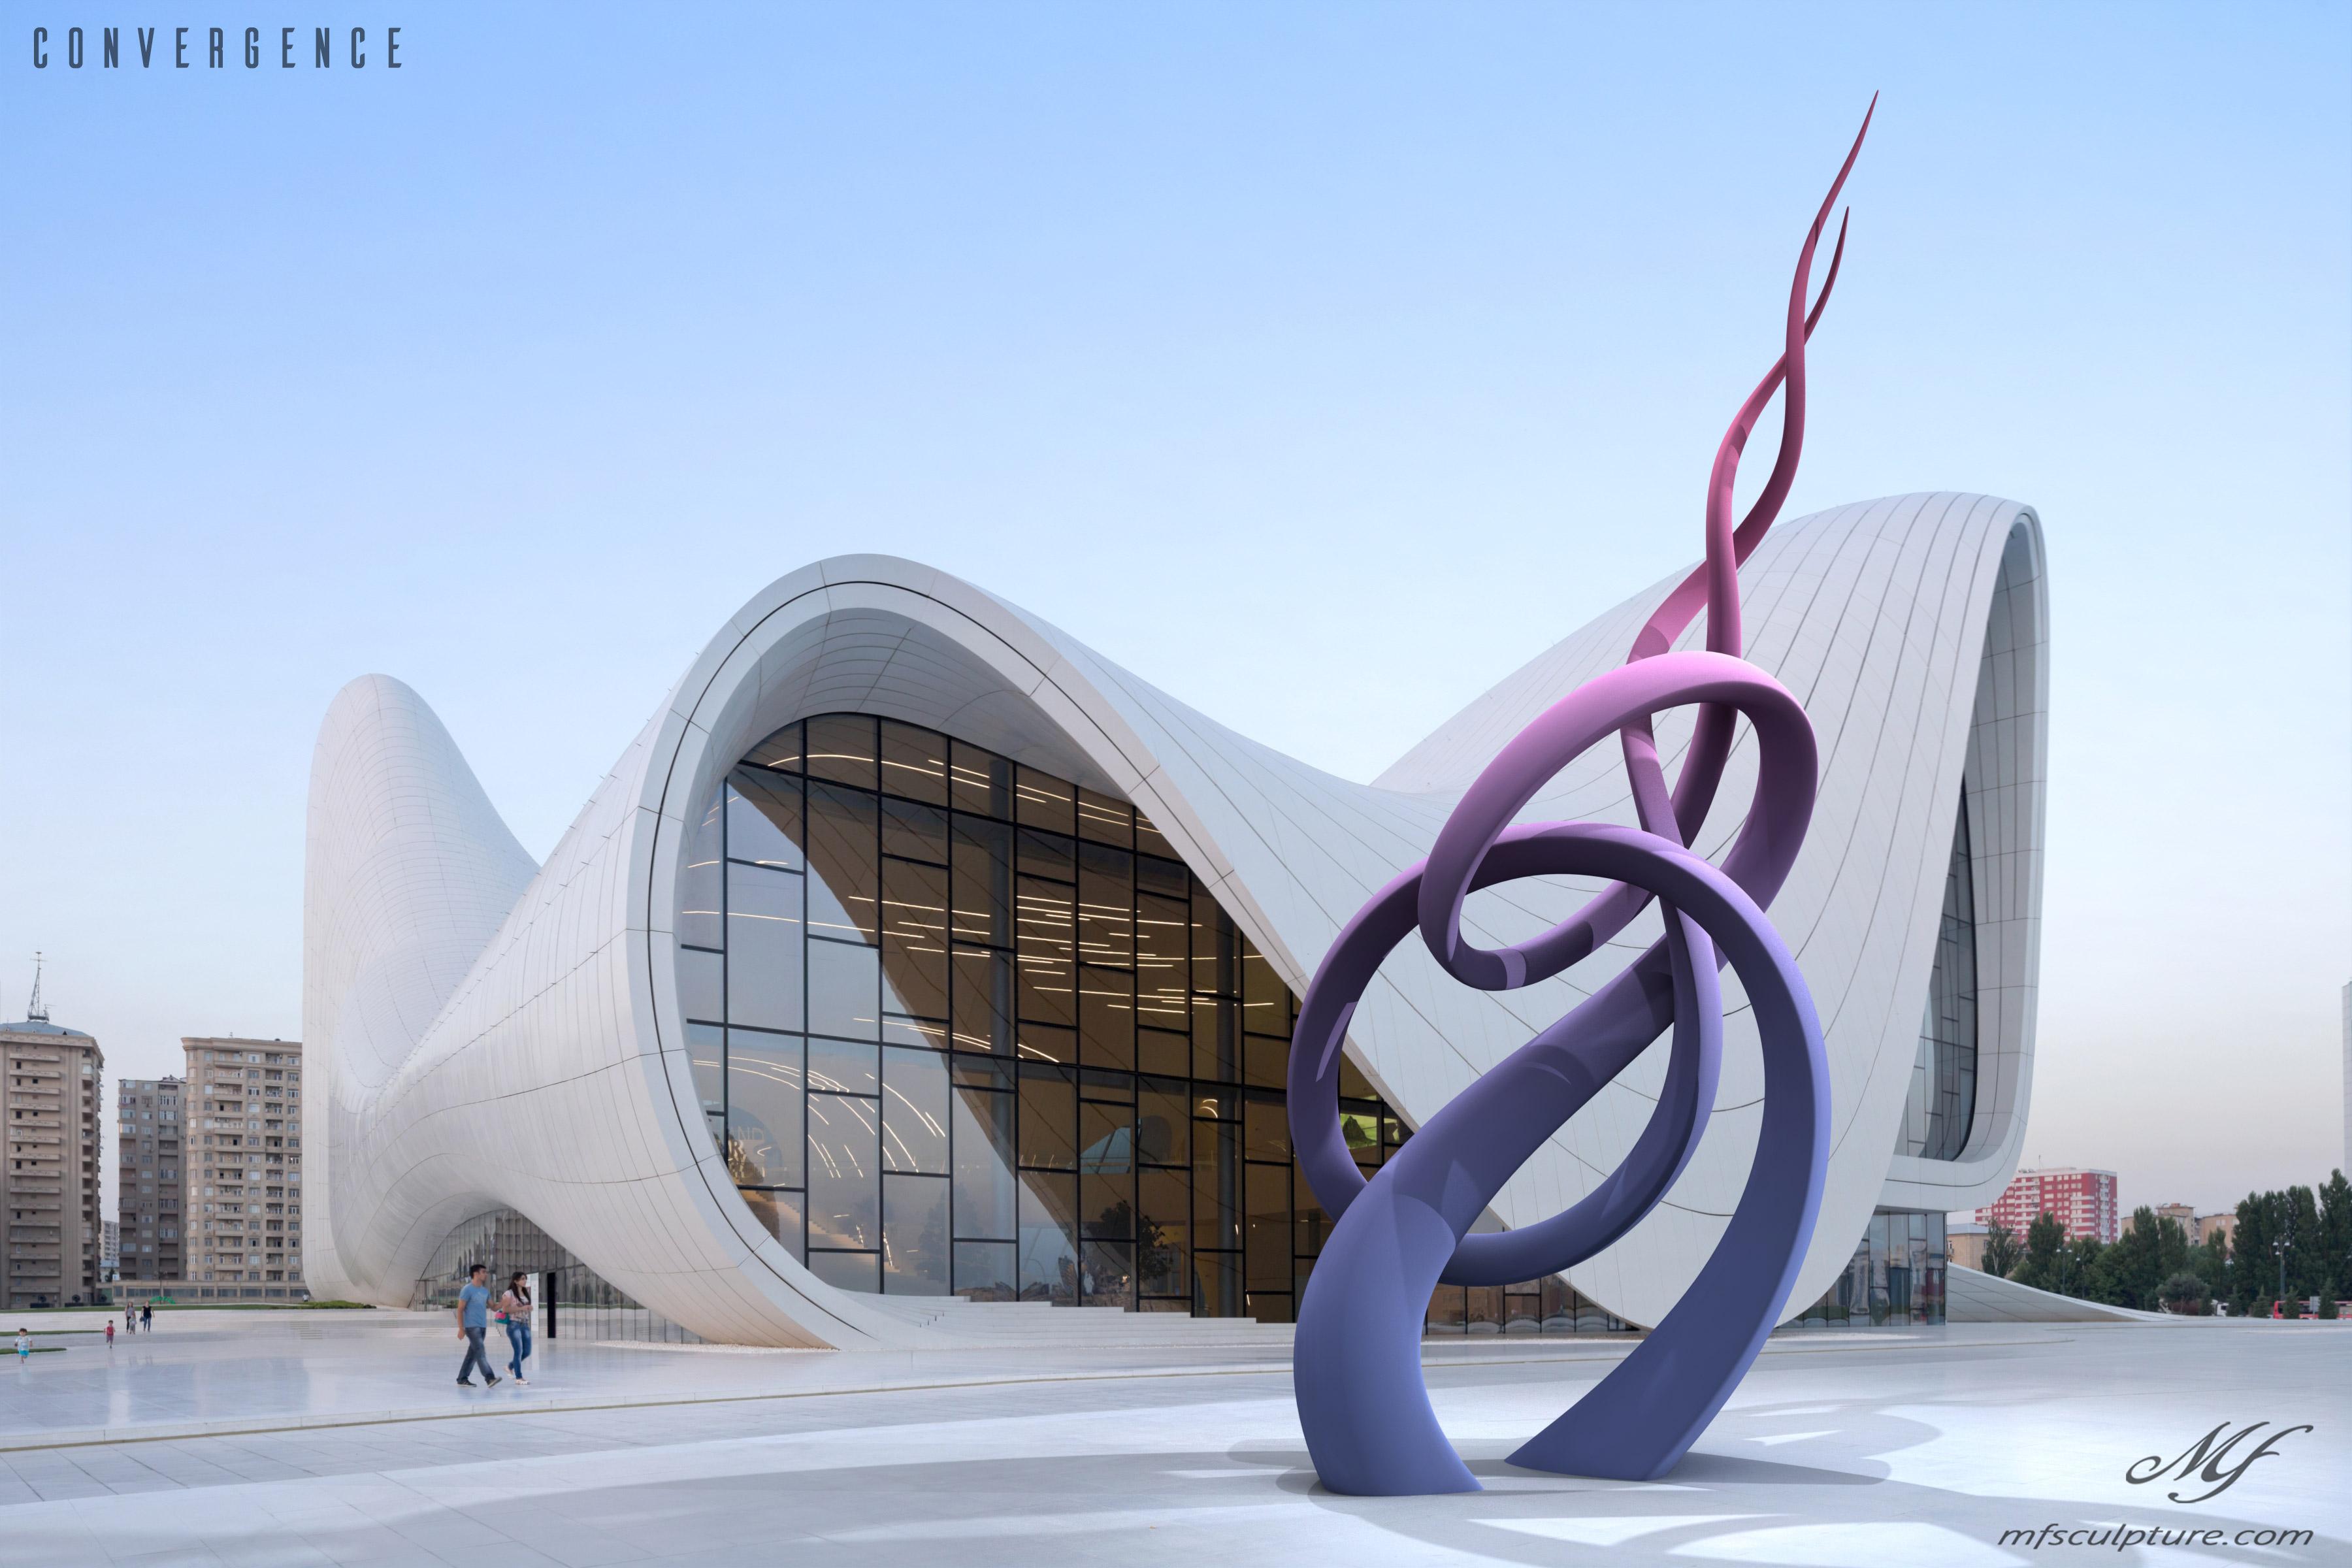 Heydar Aliyev Zaha Hadid Convergence Modern Sculpture Public Art 3